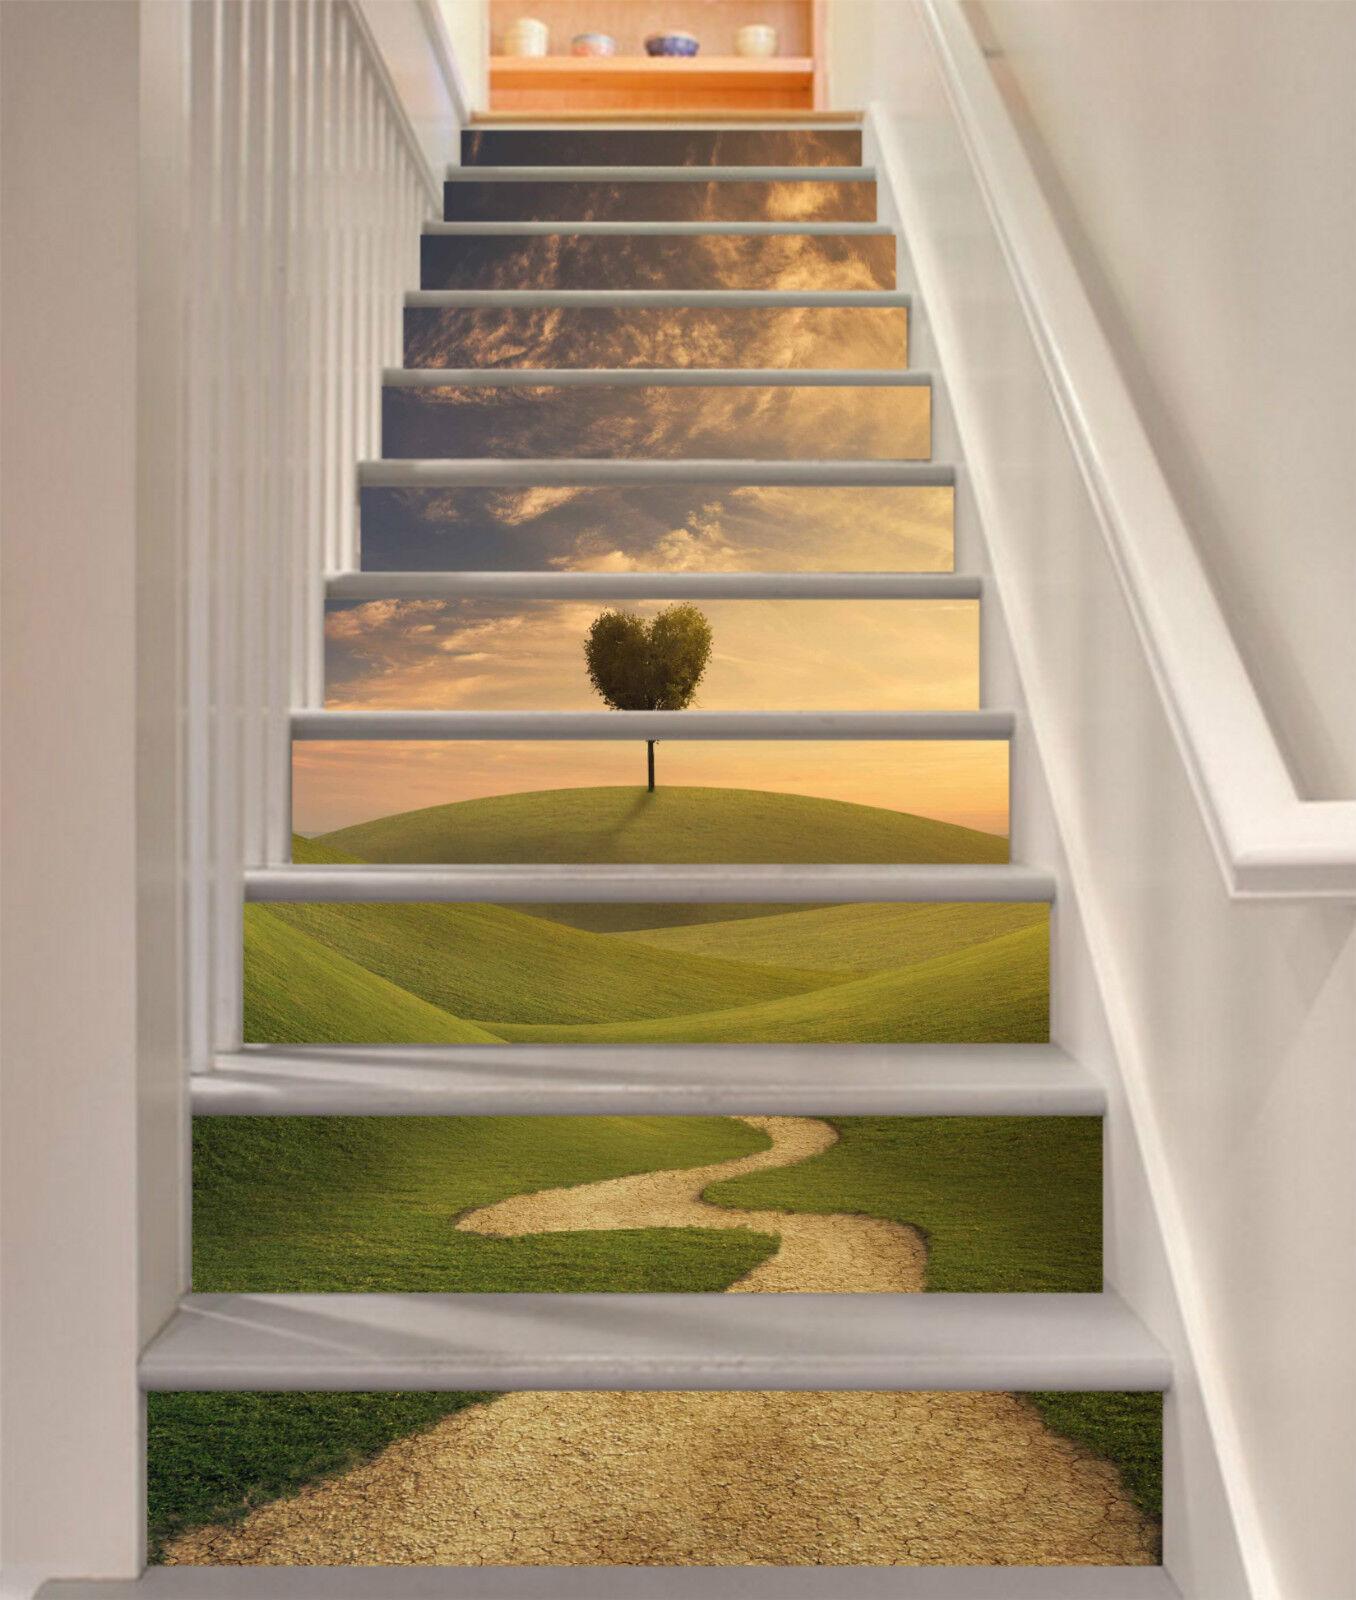 3D Hang Baum 724 Stair Risers Dekoration Fototapete Vinyl Aufkleber Tapete DE